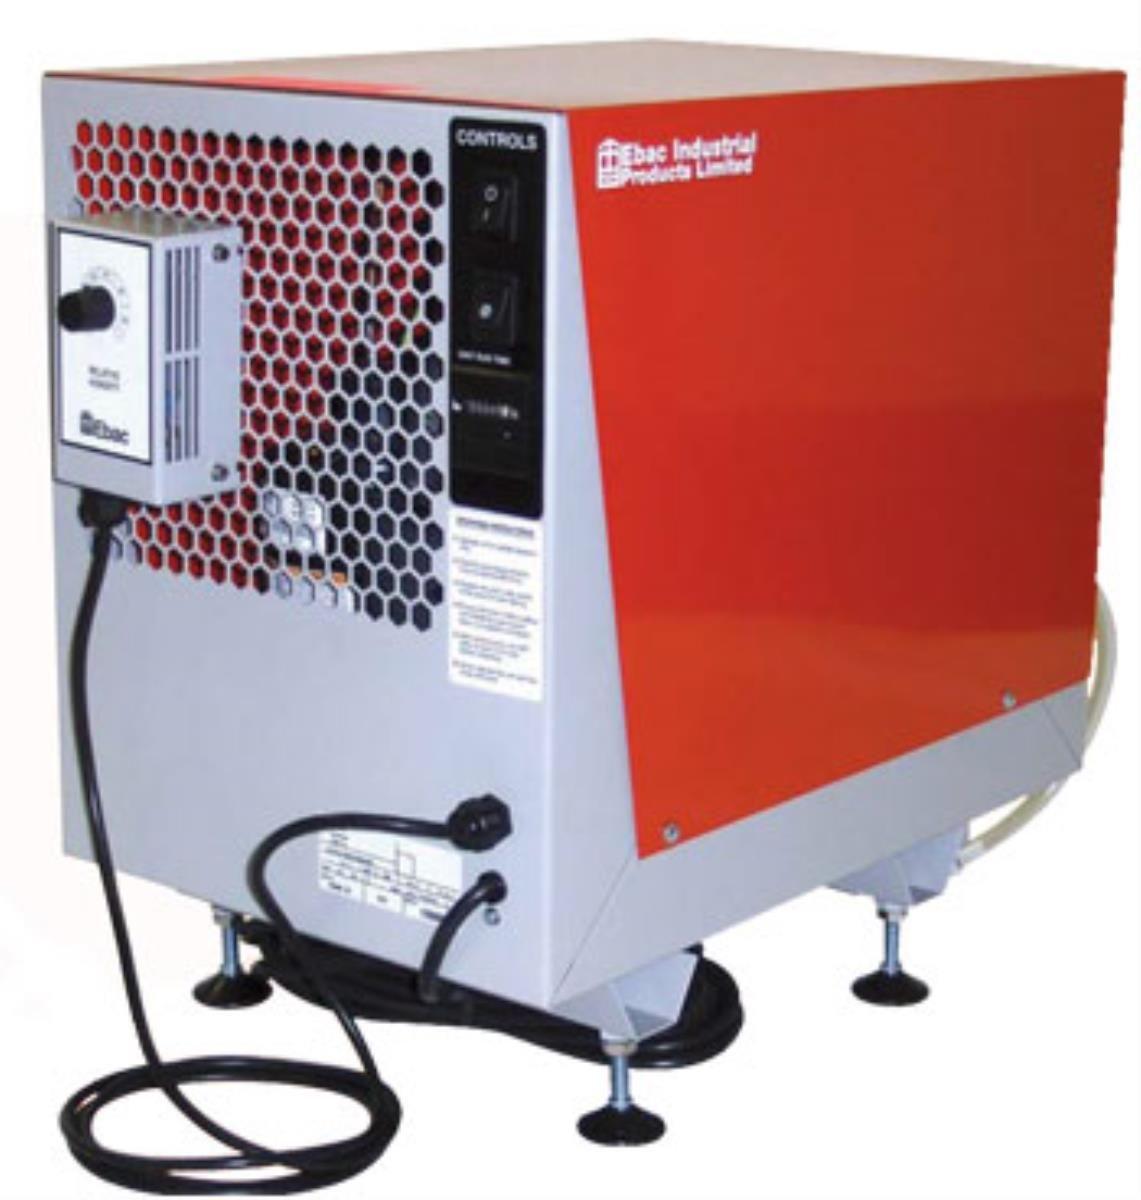 Ebac cd60 56pint commercial dehumidifier dehumidifiers